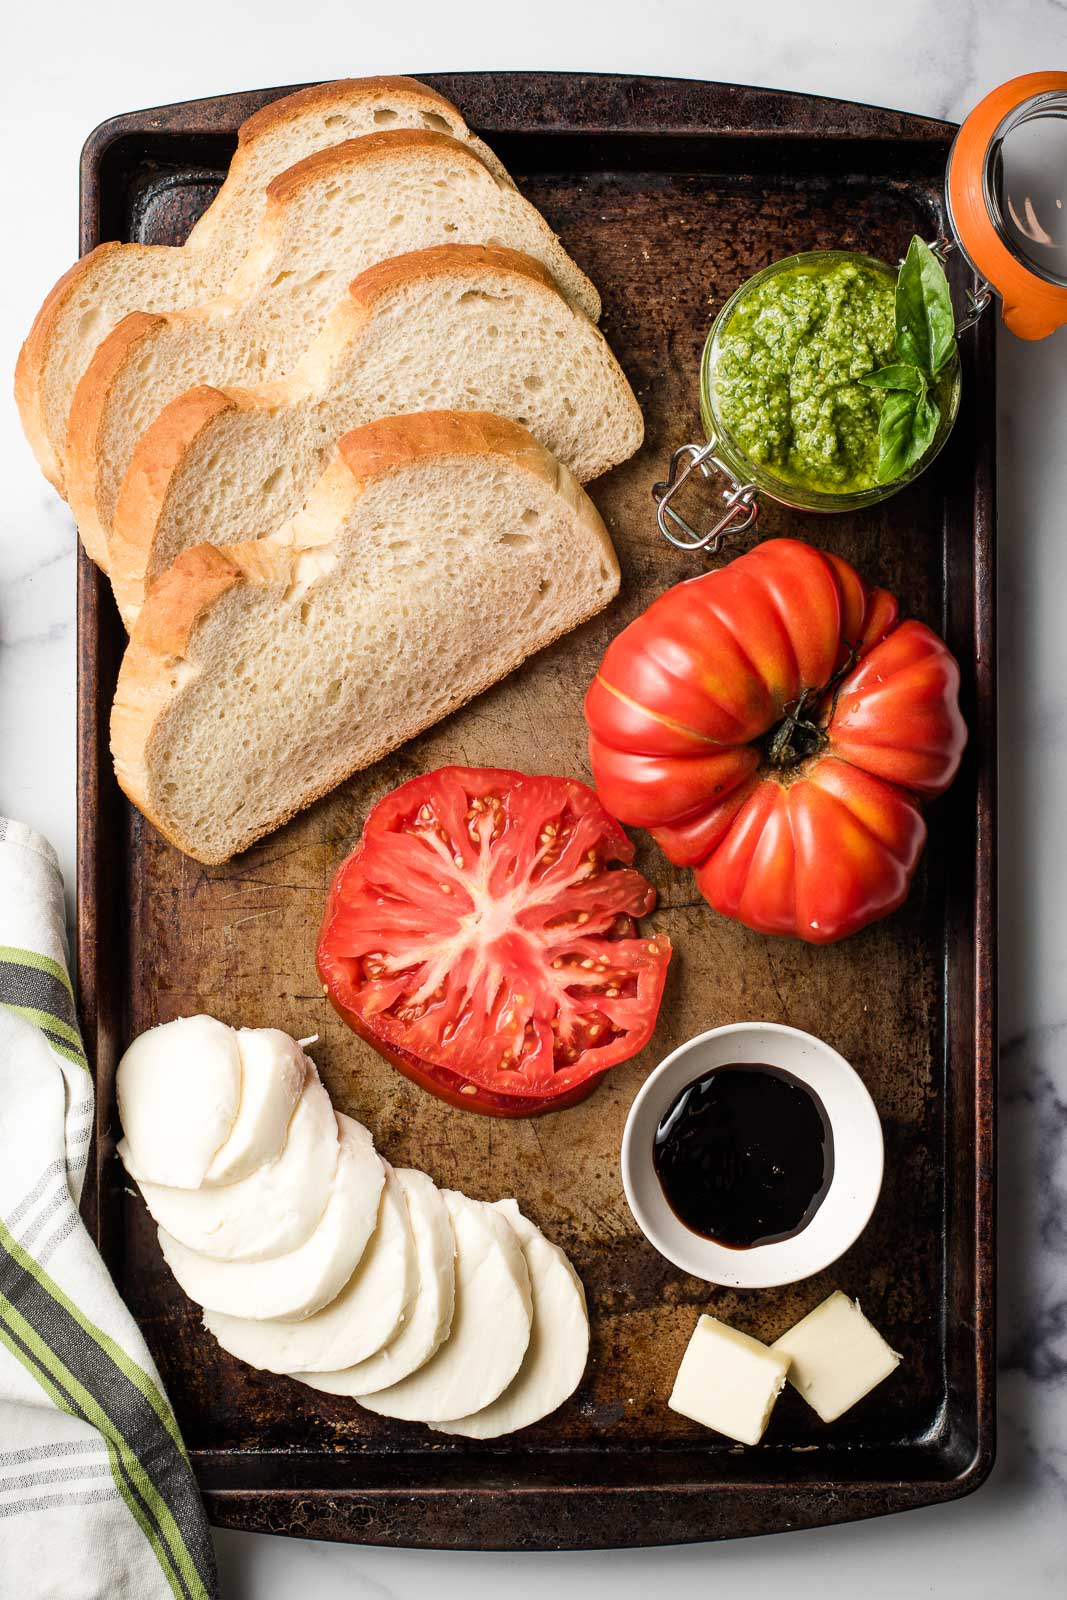 Sandwich ingredients on a baking sheet- sliced tomato, mozzarella, butter, pesto, bread, and balsamic vinegar.